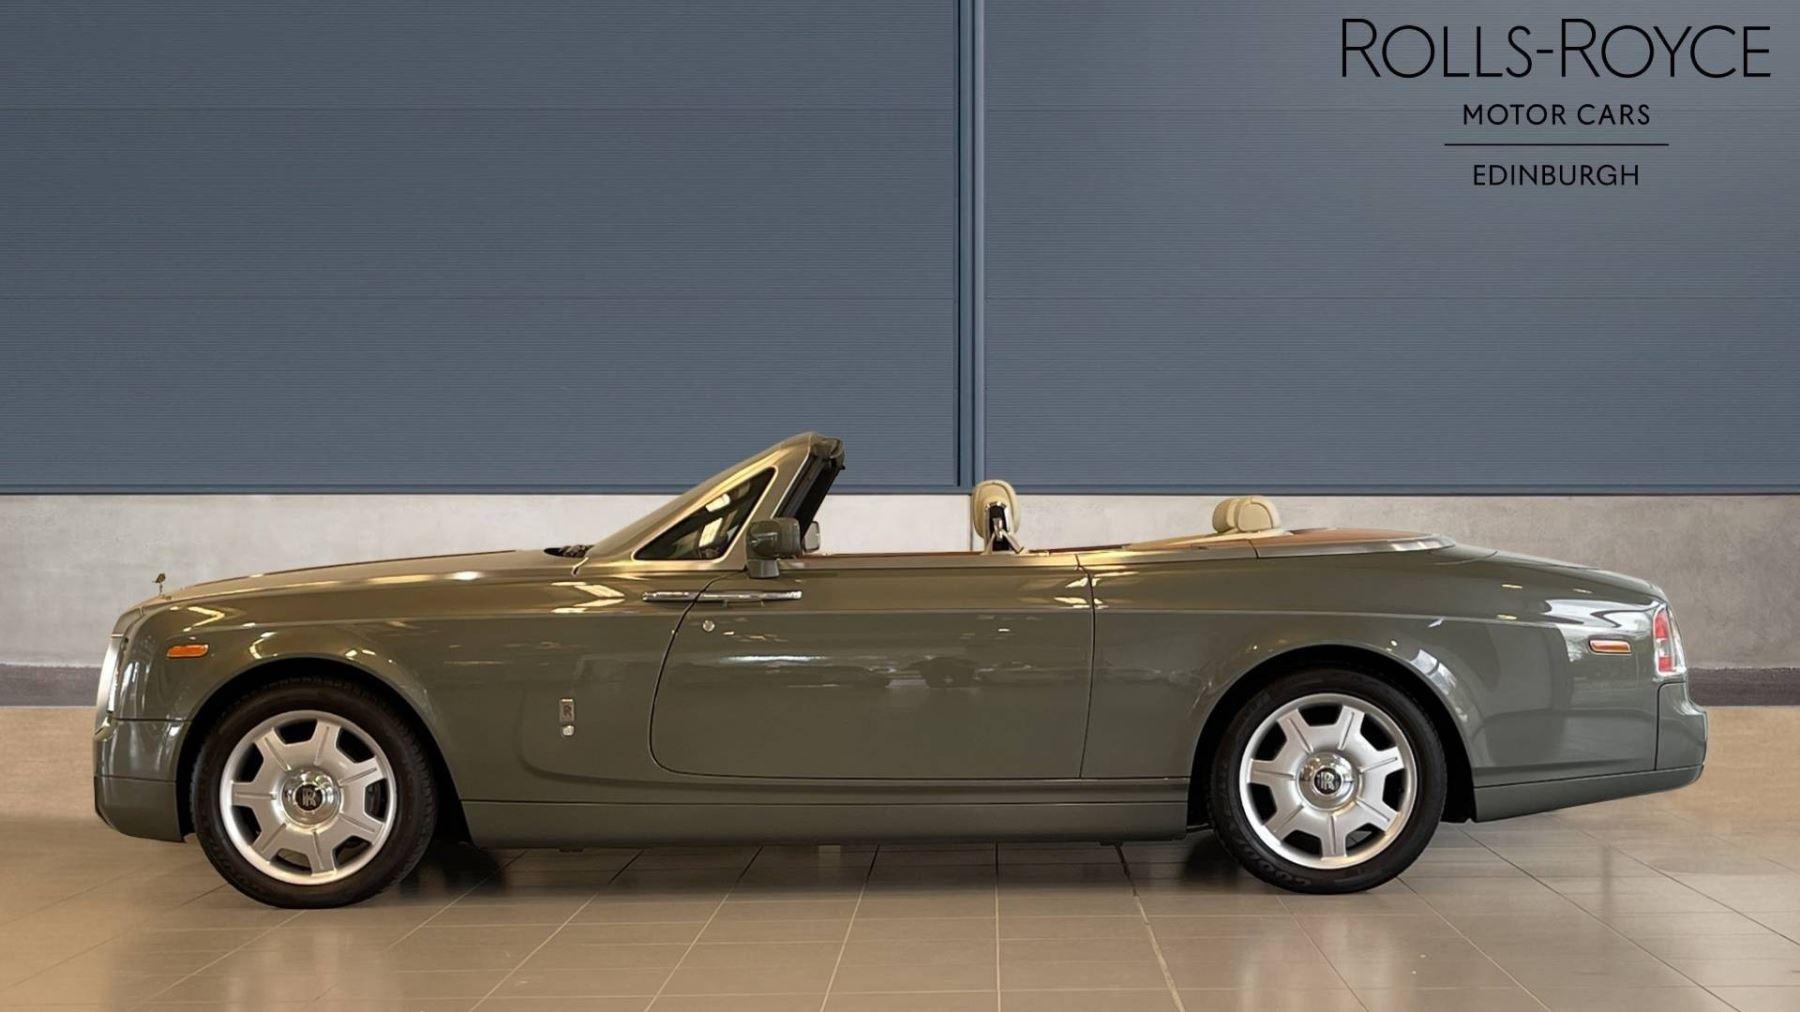 Rolls-Royce Phantom Drophead Coupe 2dr Auto image 2